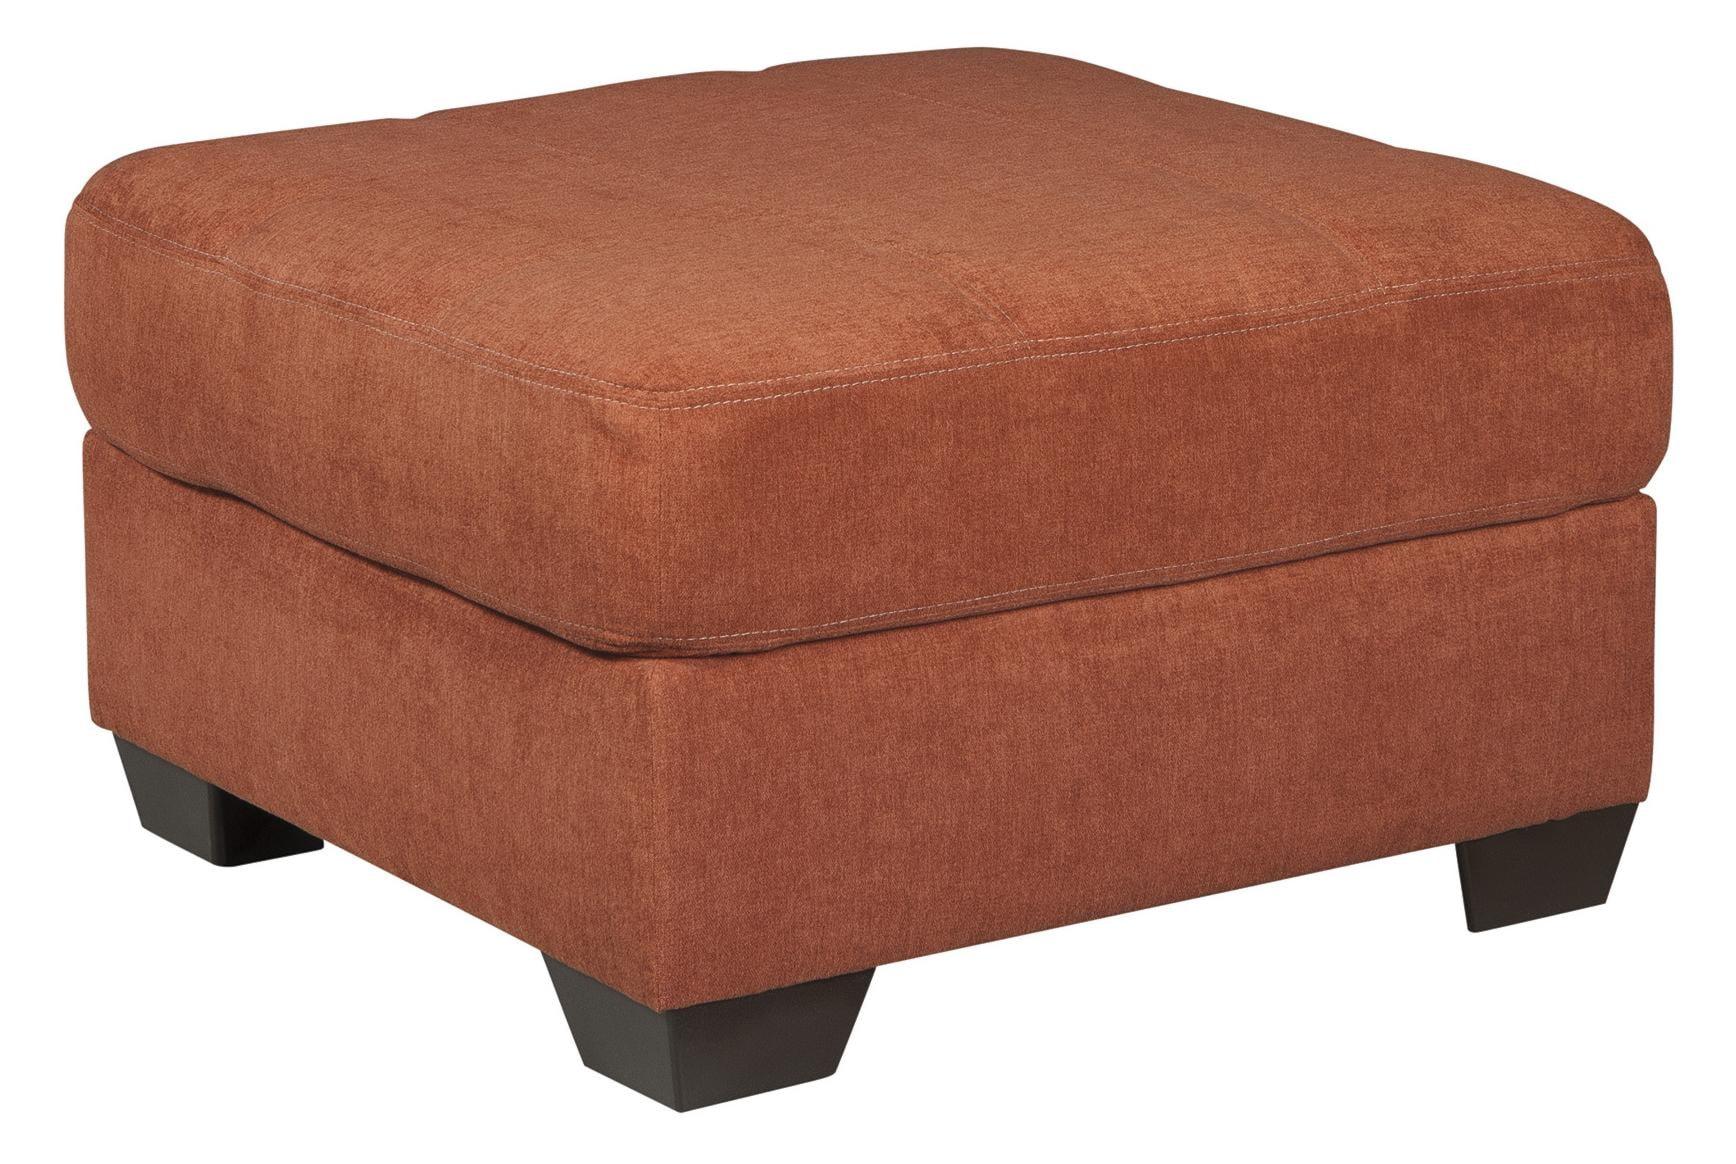 Benchcraft Delta City - Rust Contemporary Oversized Accent Ottoman - Ivan Smith Furniture - Ottoman